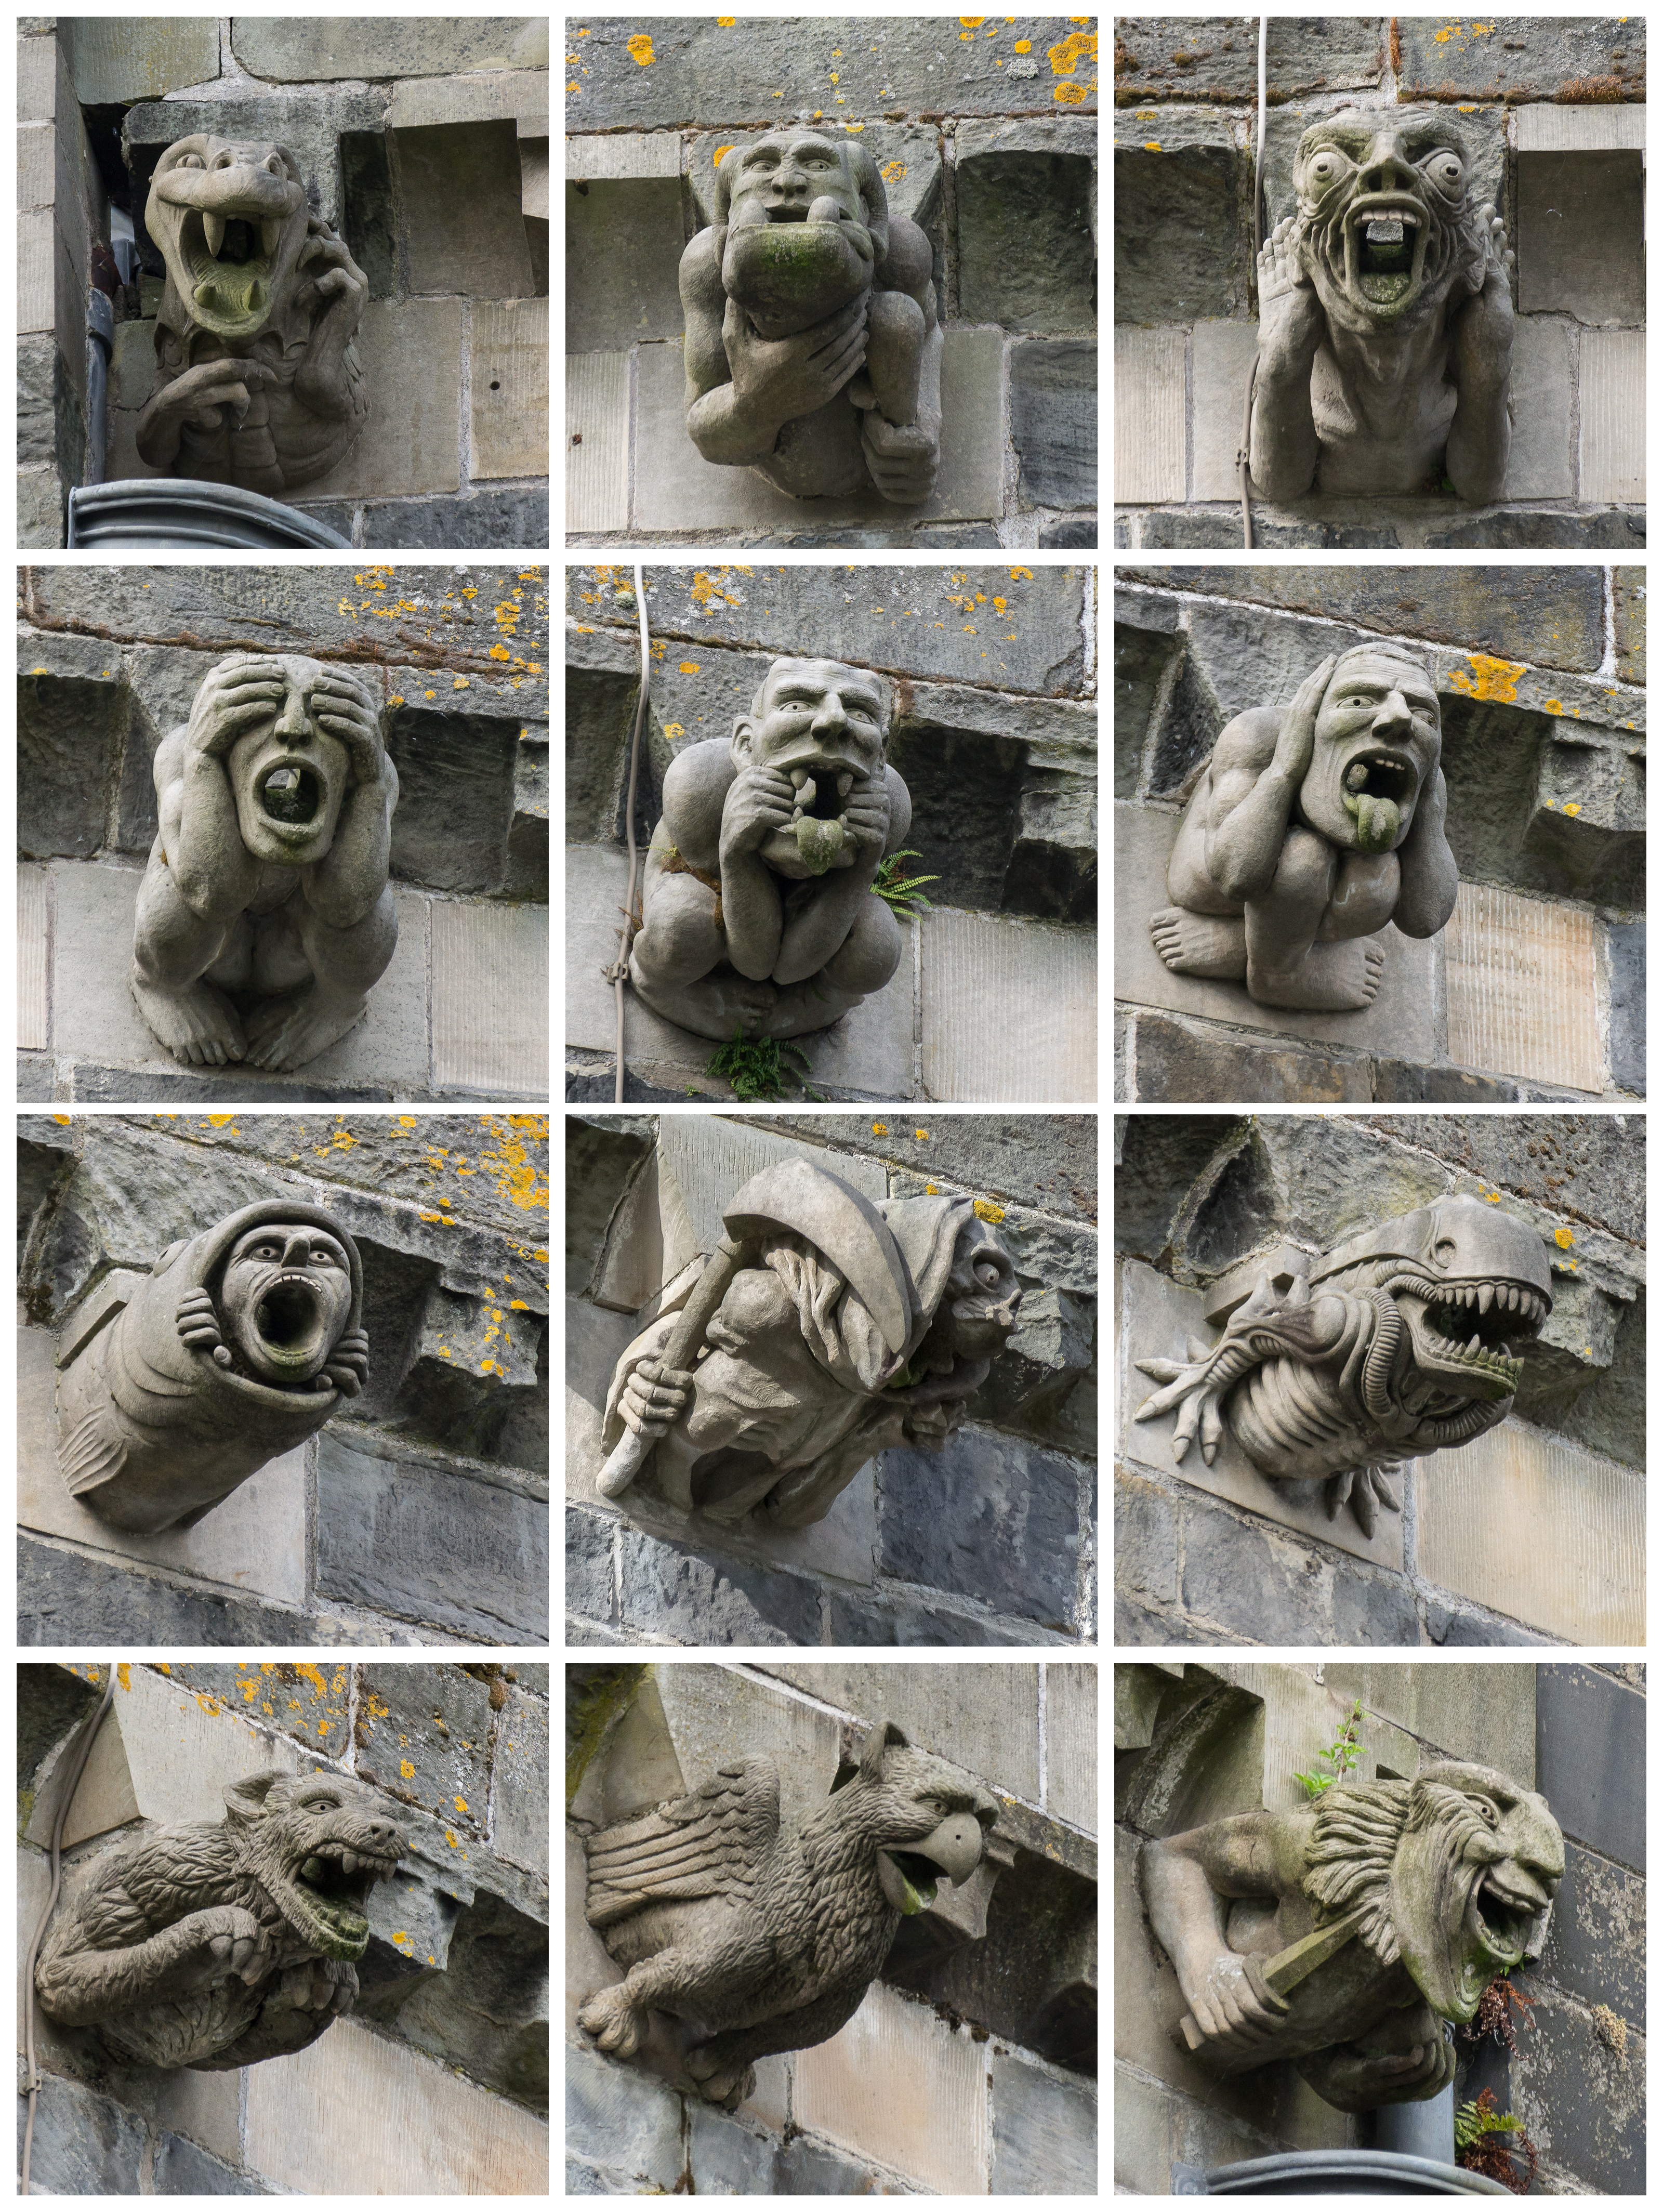 https://upload.wikimedia.org/wikipedia/commons/b/bd/Paisley_Abbey_New_Gargoyles.jpg